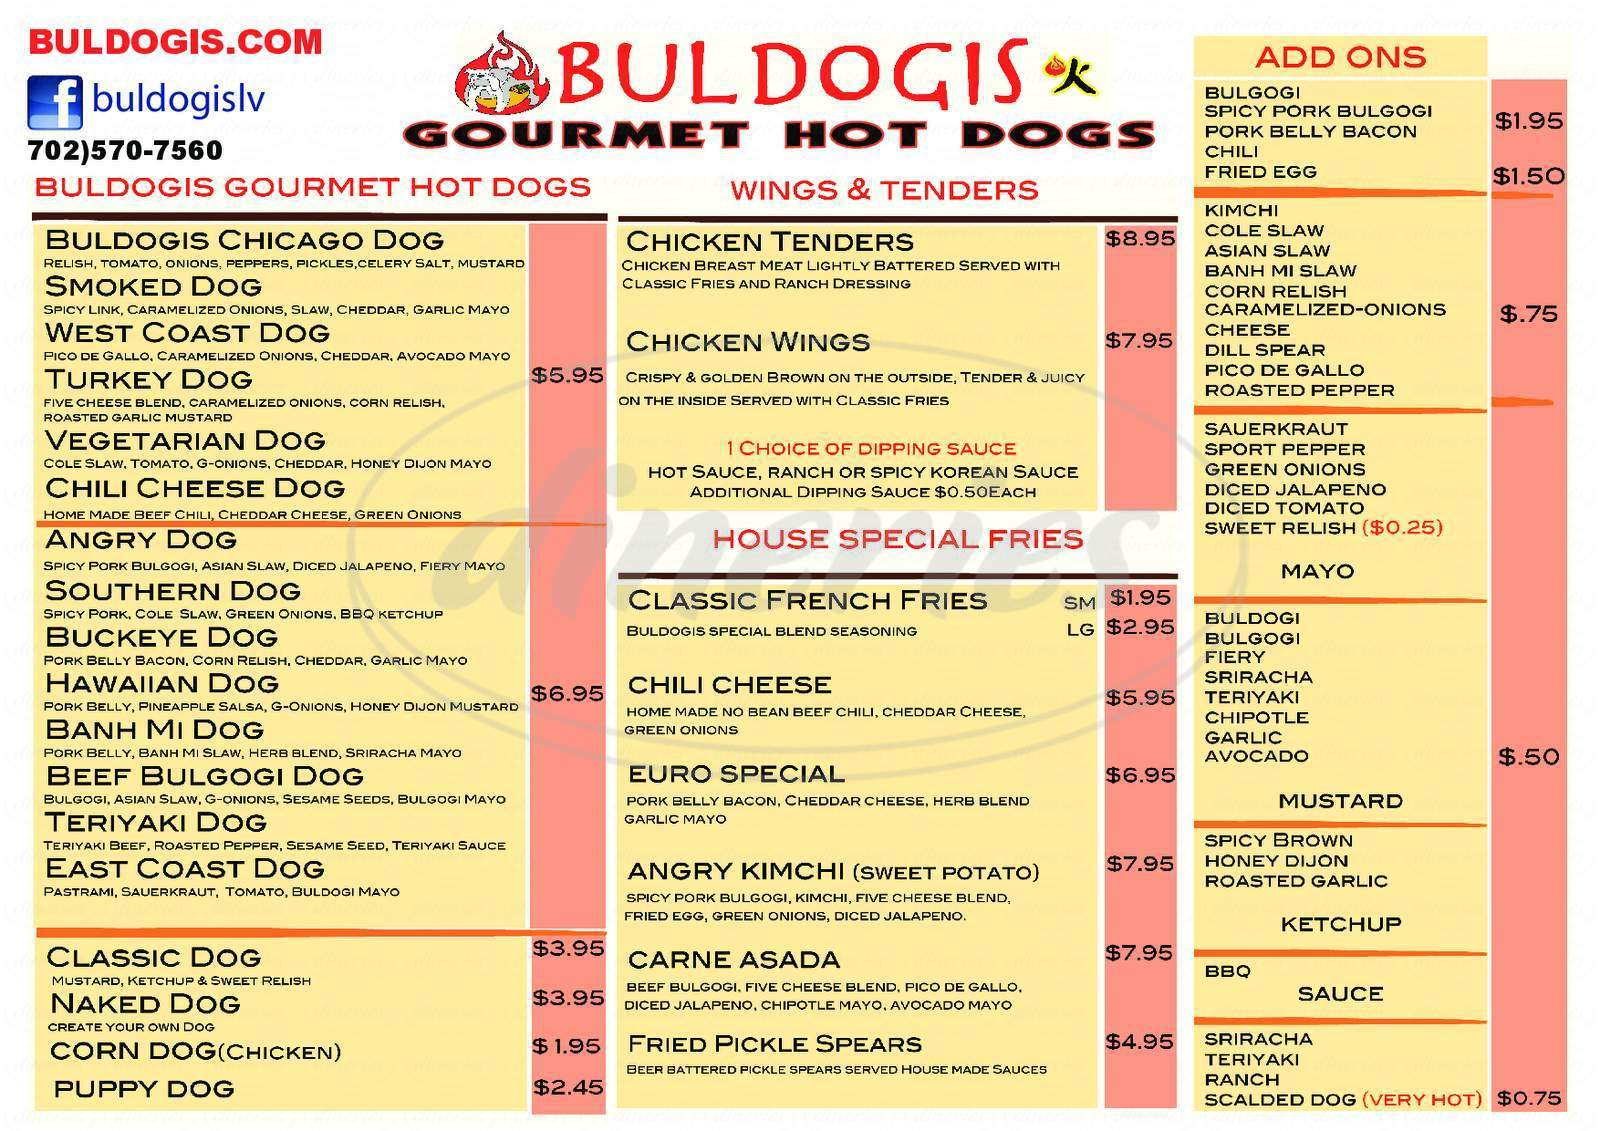 menu for Buldogis Gourmet Hot Dogs